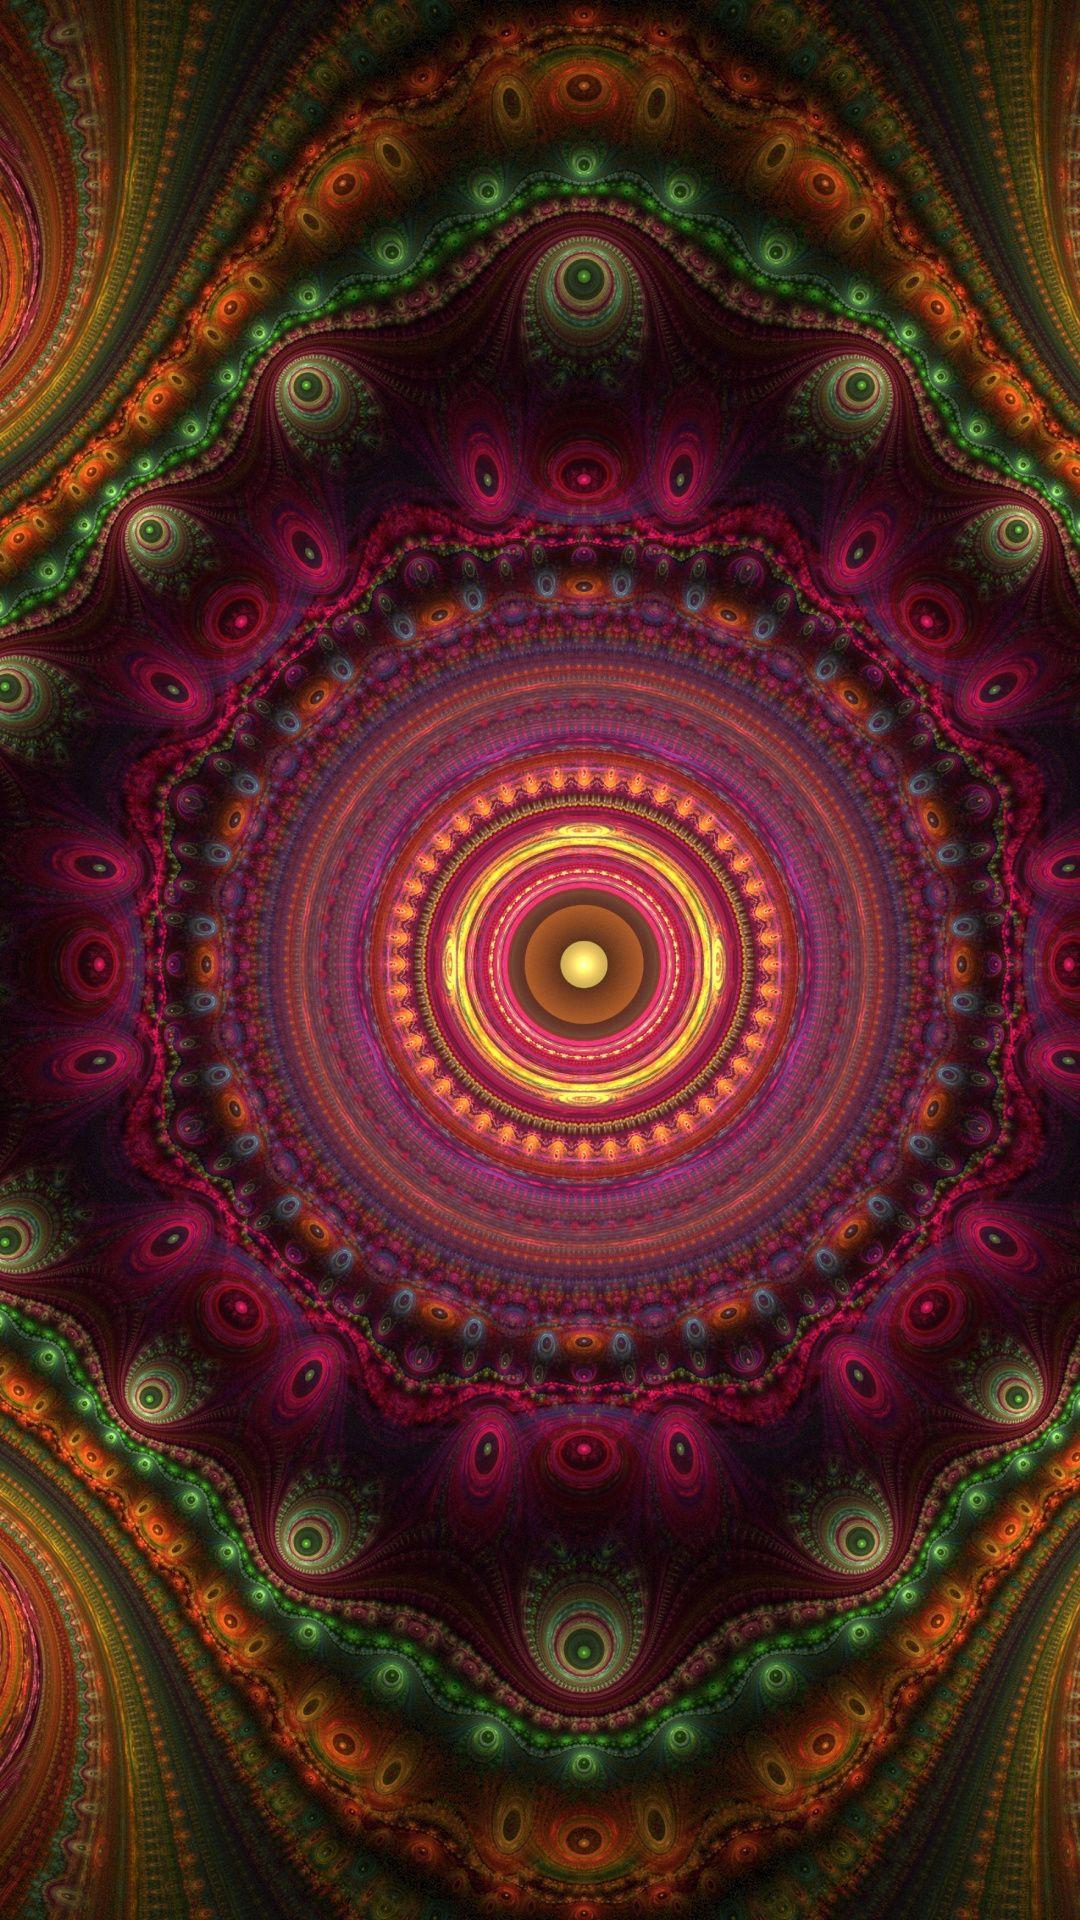 1080x1920 Artwork Fractal Pattern Kaleidoscope Wallpaper Fractal Art Fractal Patterns Wallpaper